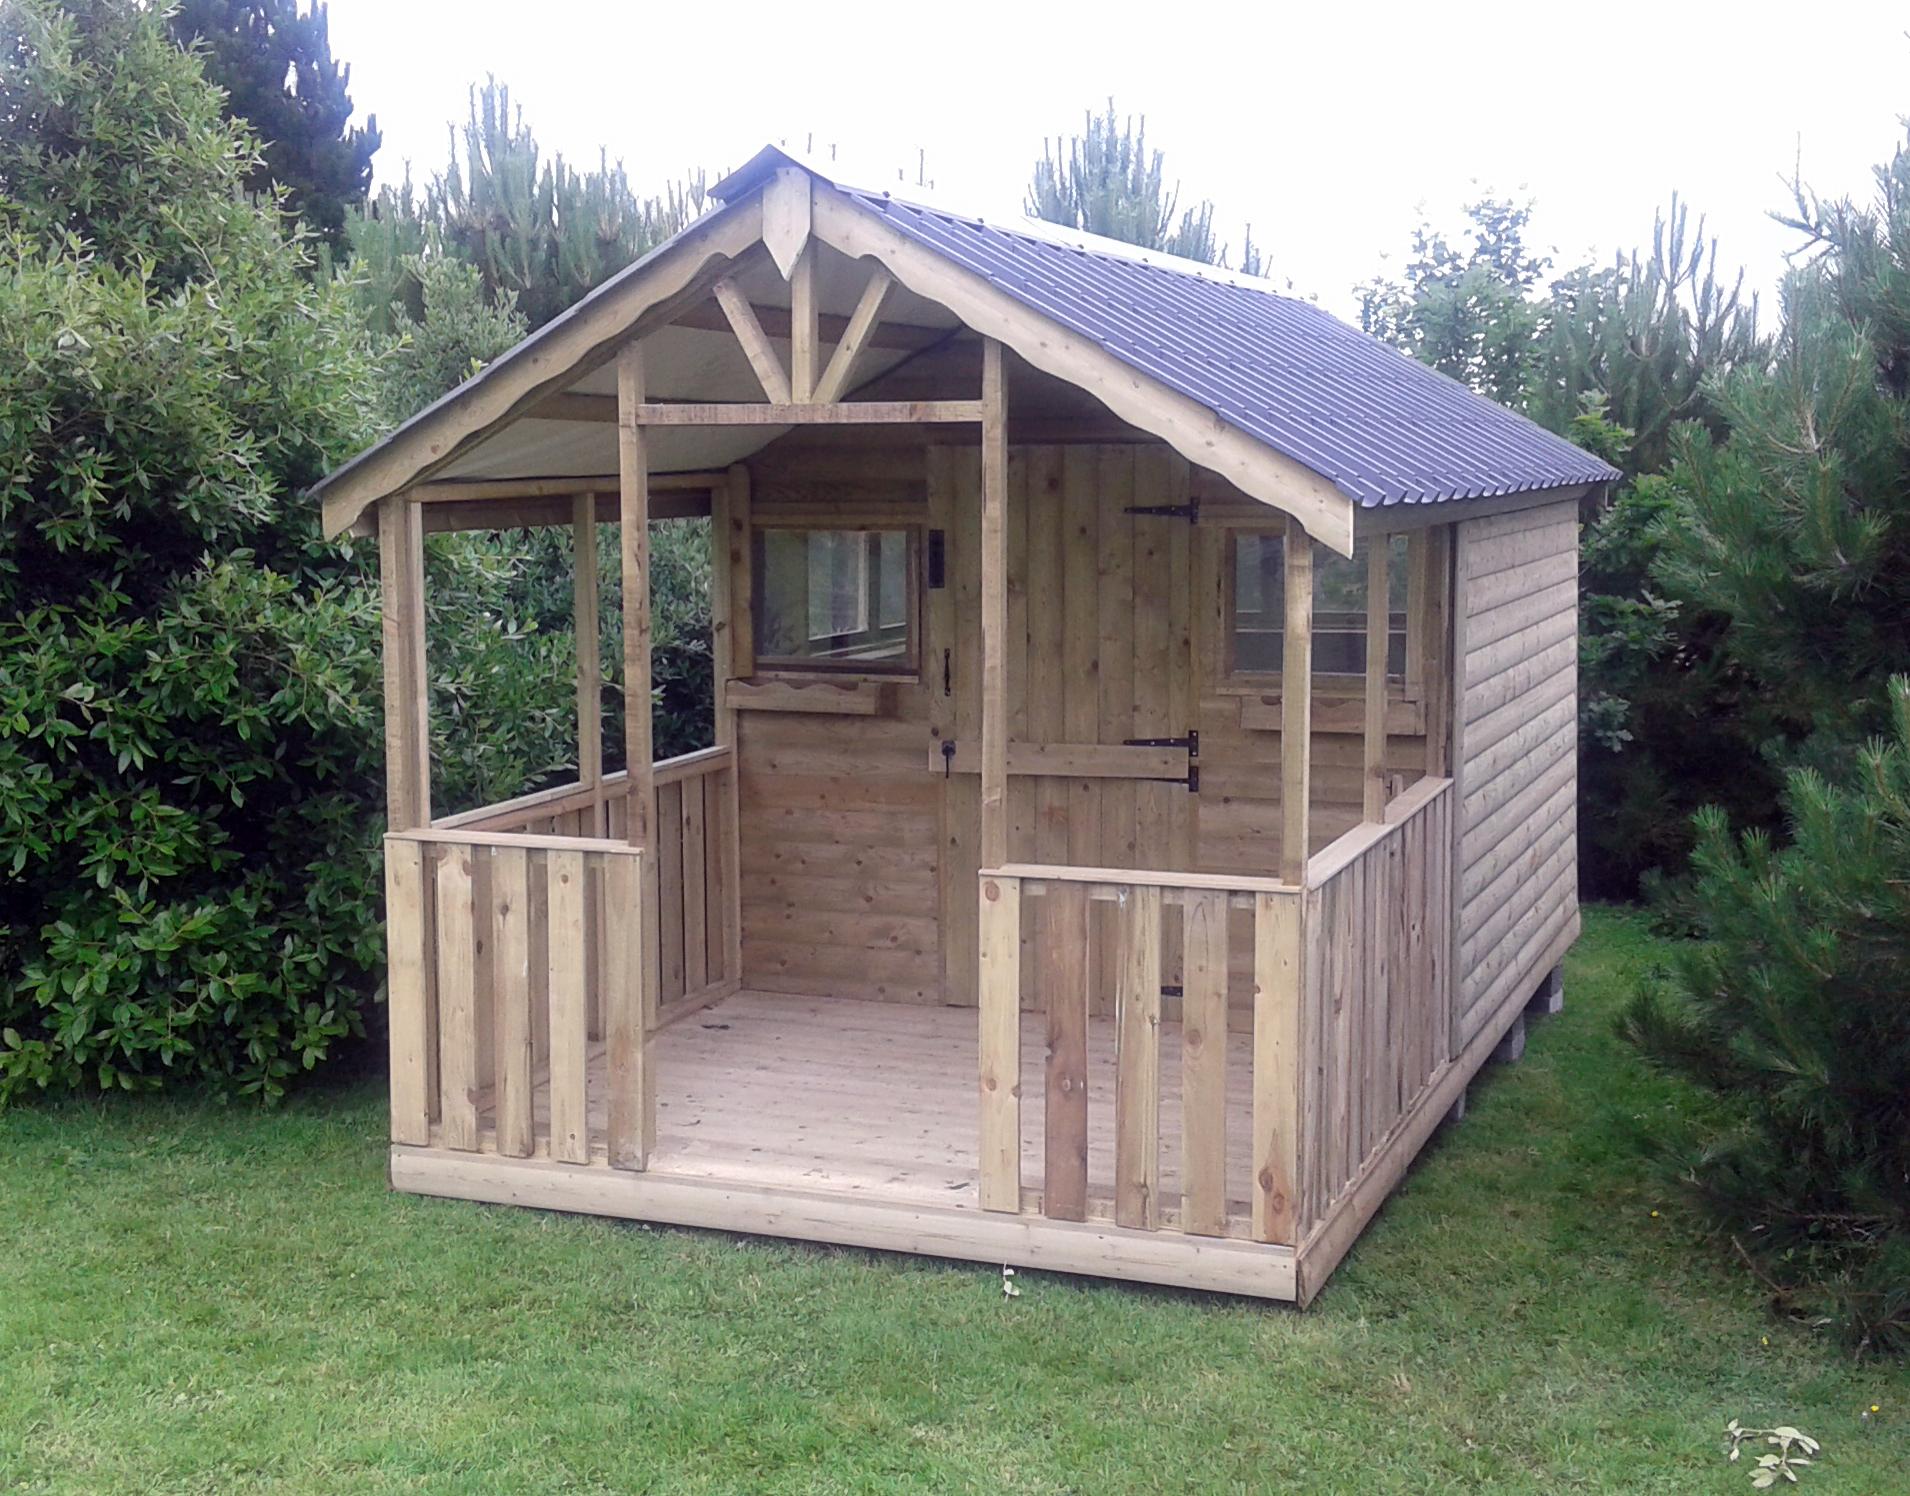 09 12x8 barrelboard verandah shed 5ft verandah tile effect roof - Garden Sheds With Veranda